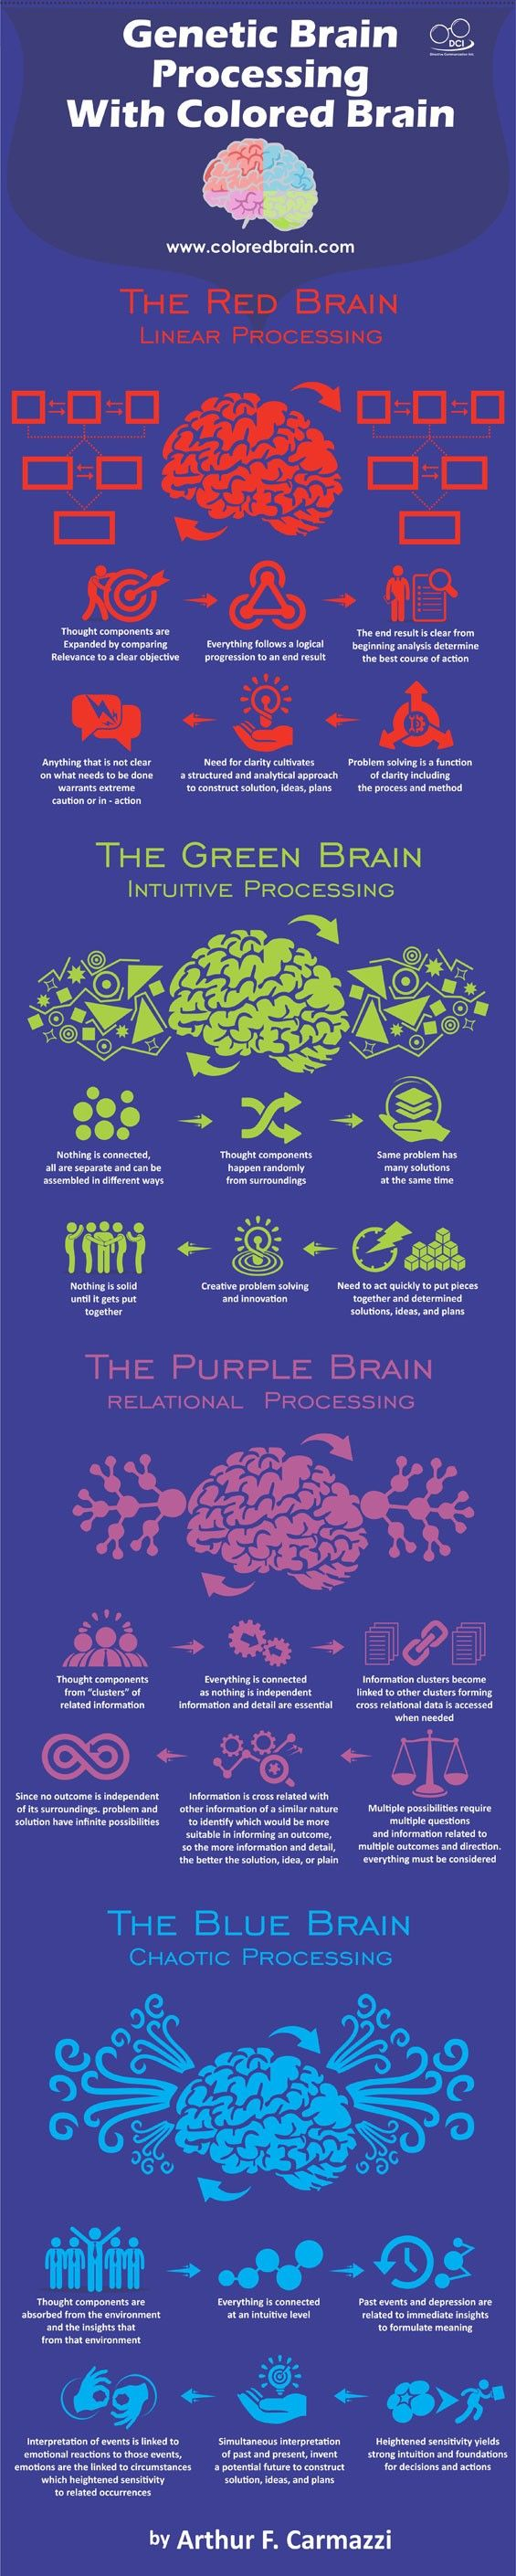 Colored Brain Communication Processes By Arthur Carmazzi